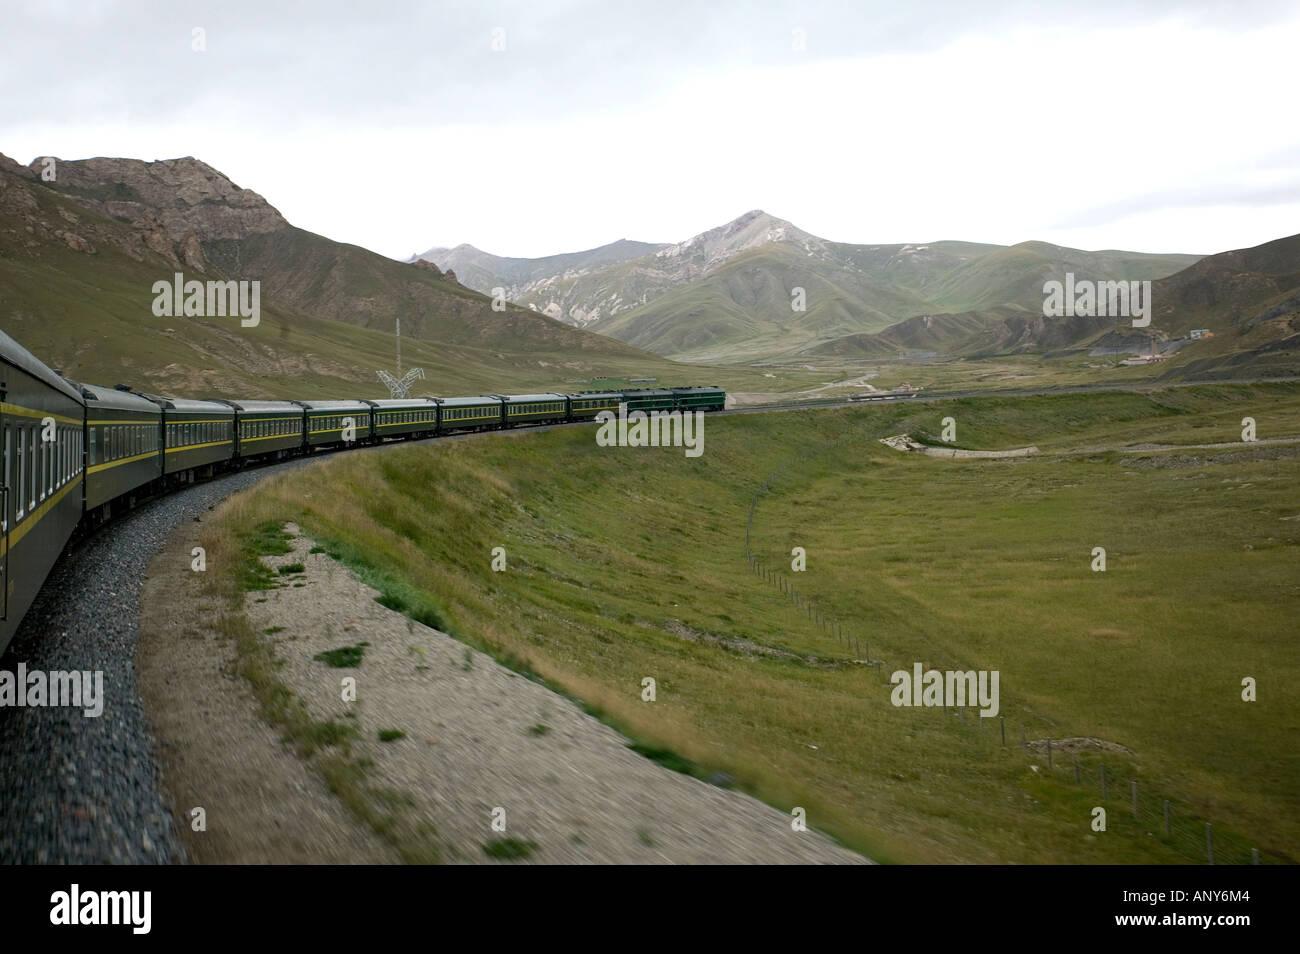 The Shangri La Express train making its way through China towards Lhasa Tibet - Stock Image